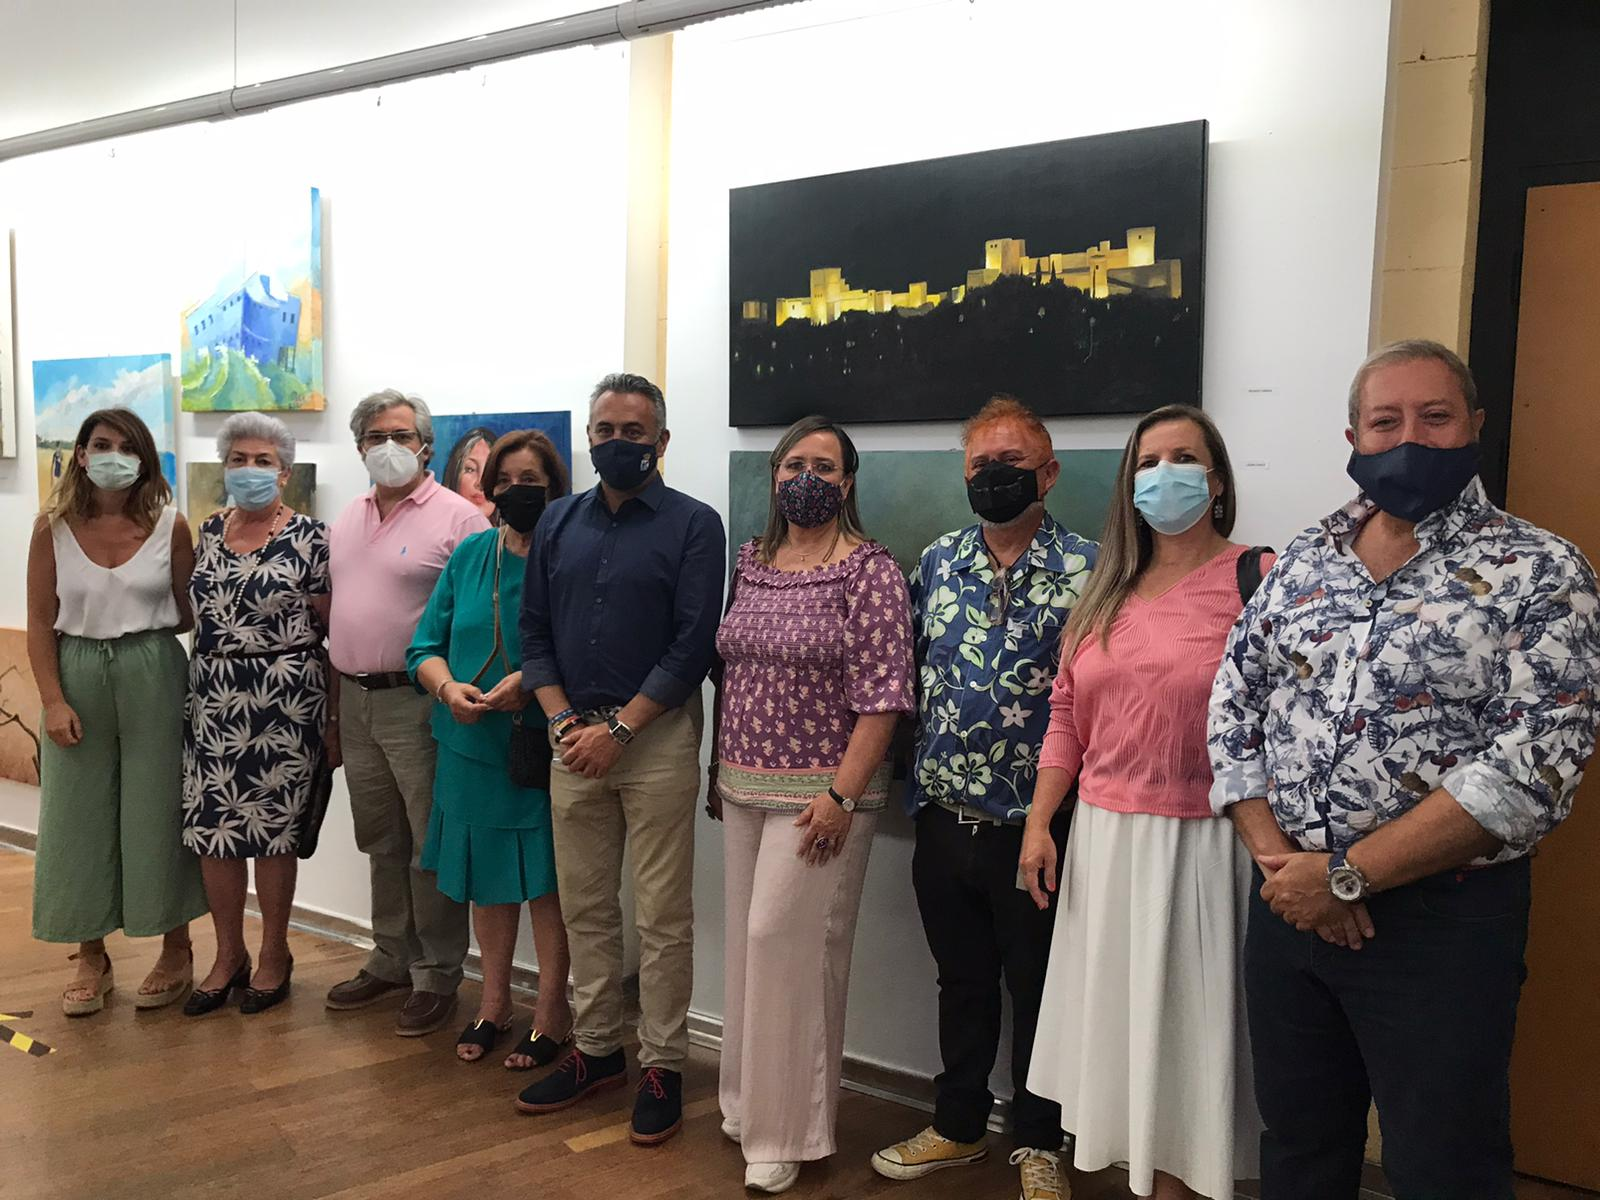 La Exposición fin de curso clausura el Taller Municipal de Artes Plásticas 'Daniel Vázquez Díaz' de Isla Cristina